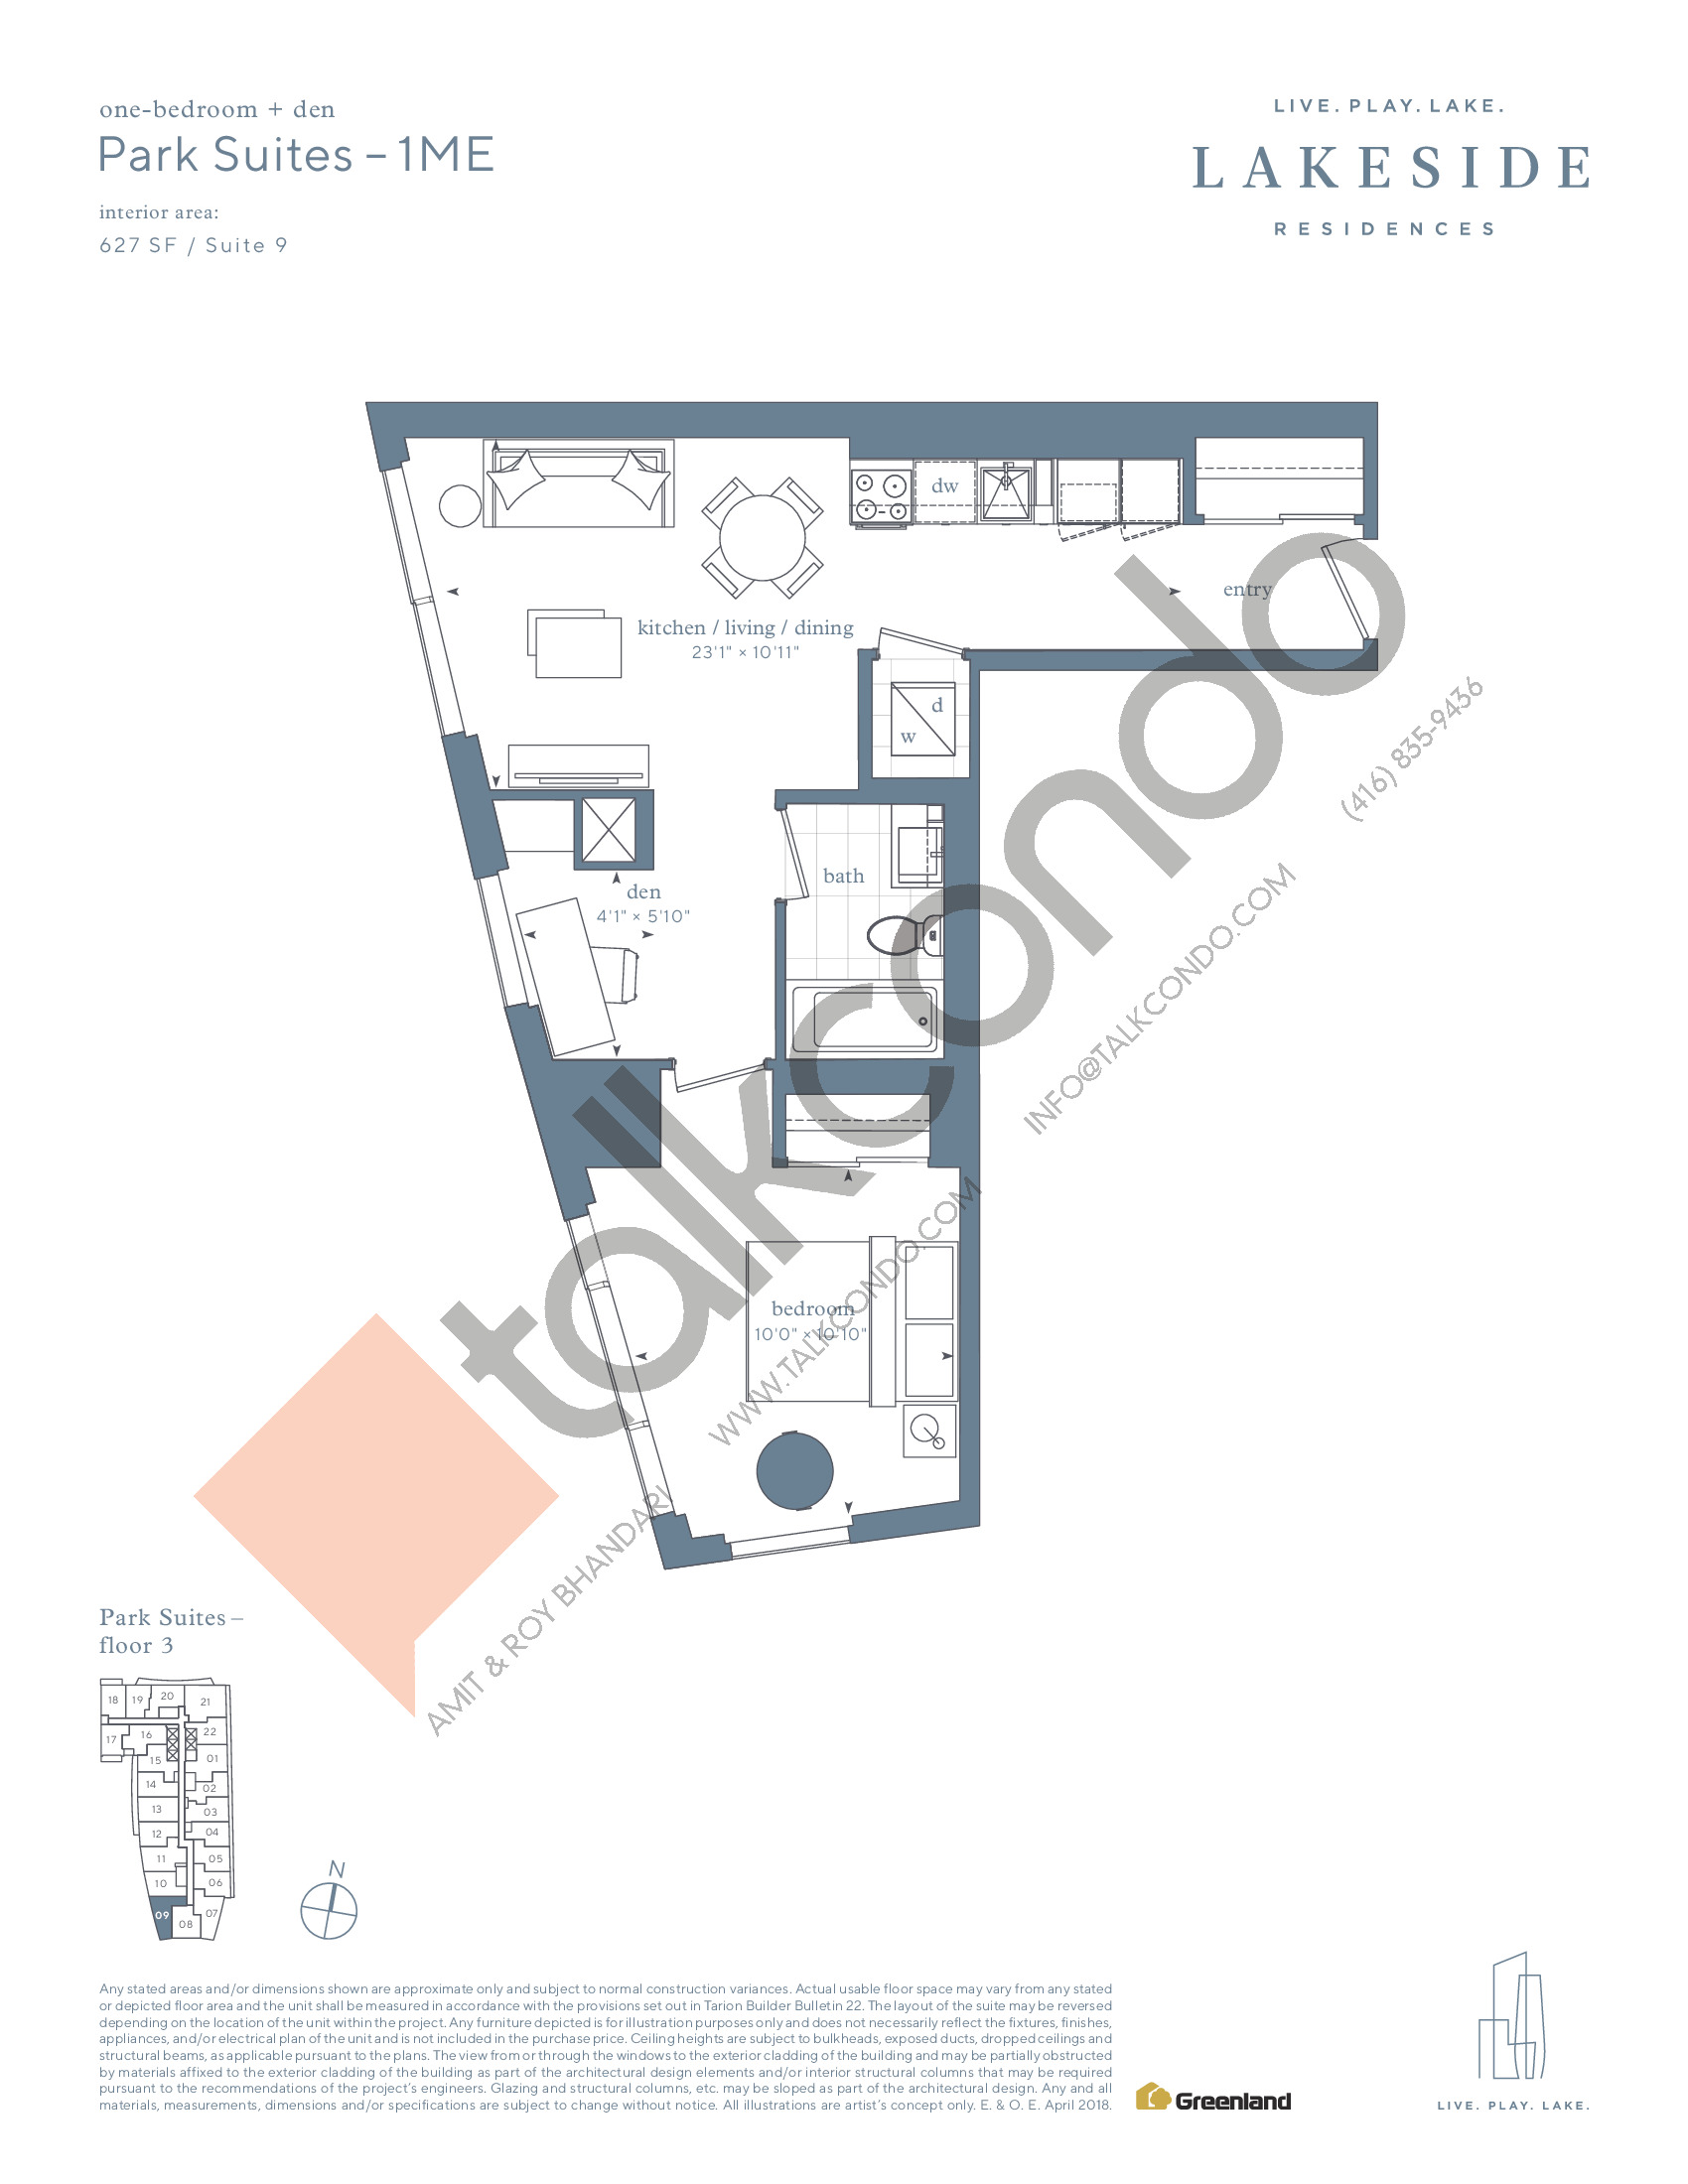 Park Suites - 1ME Floor Plan at Lakeside Residences - 627 sq.ft